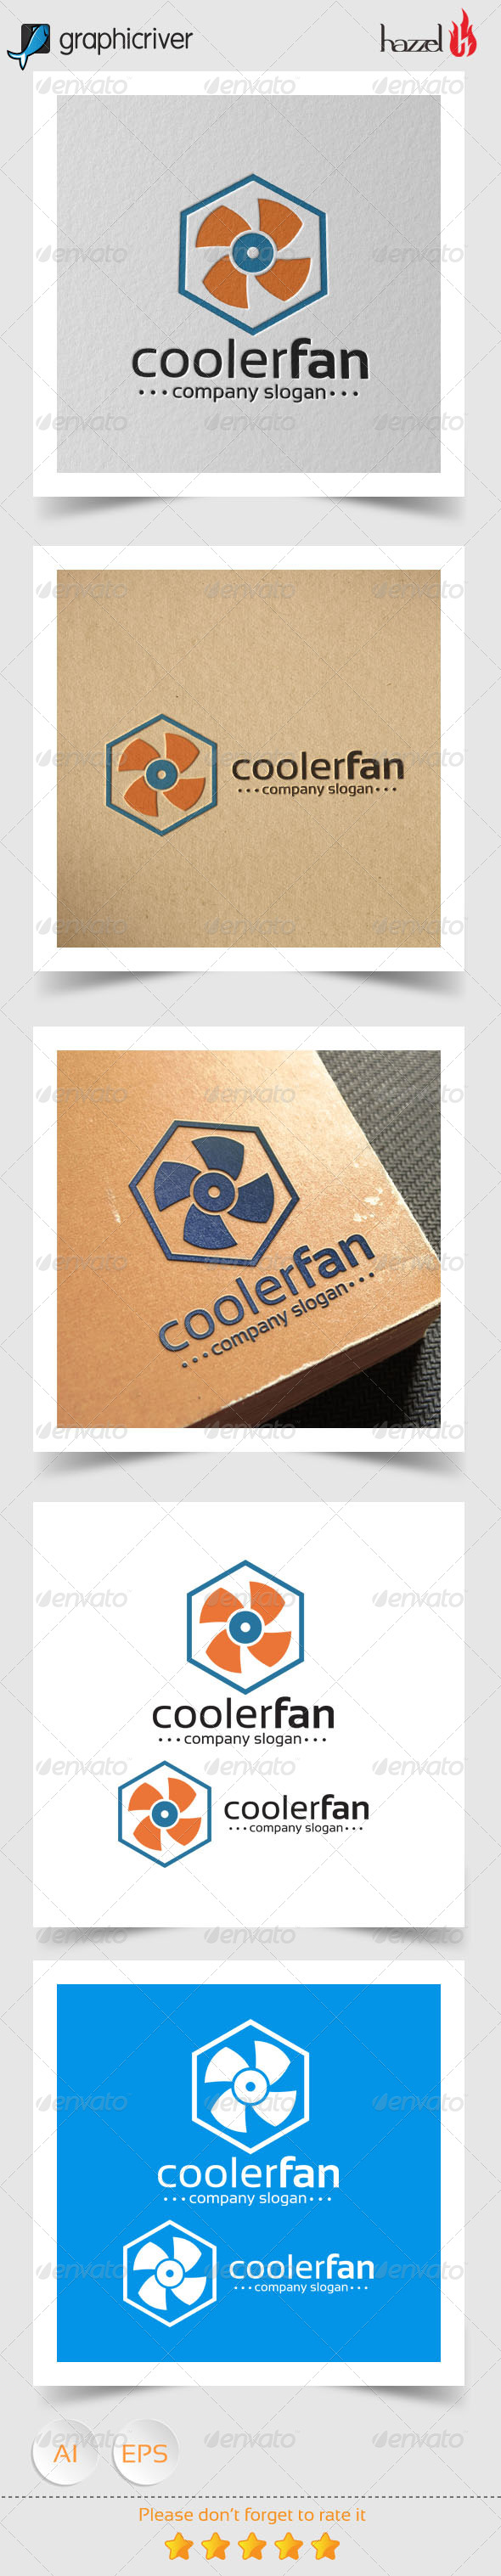 GraphicRiver Cooler Fan Logo 8243347